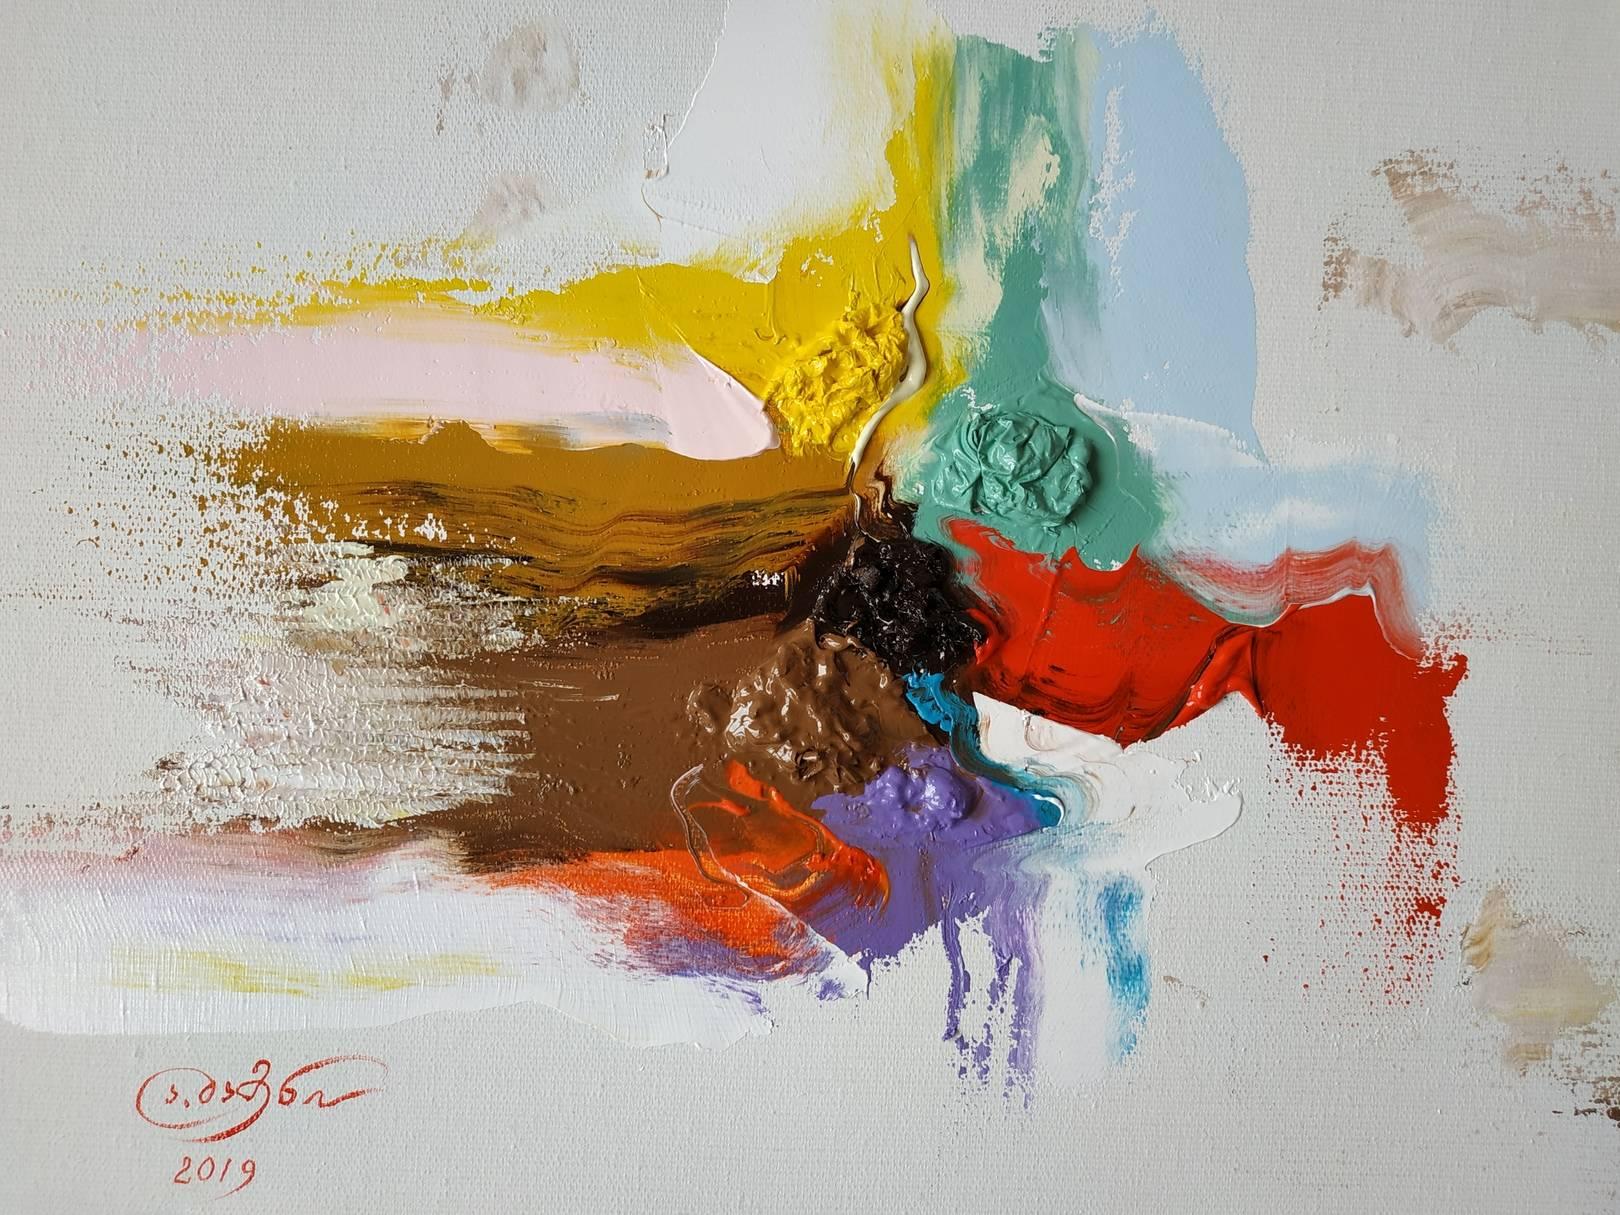 «Фантасмагория»           холст, масло «Phantasmagoria»                     oil on canvas                                                      30x40,  2019